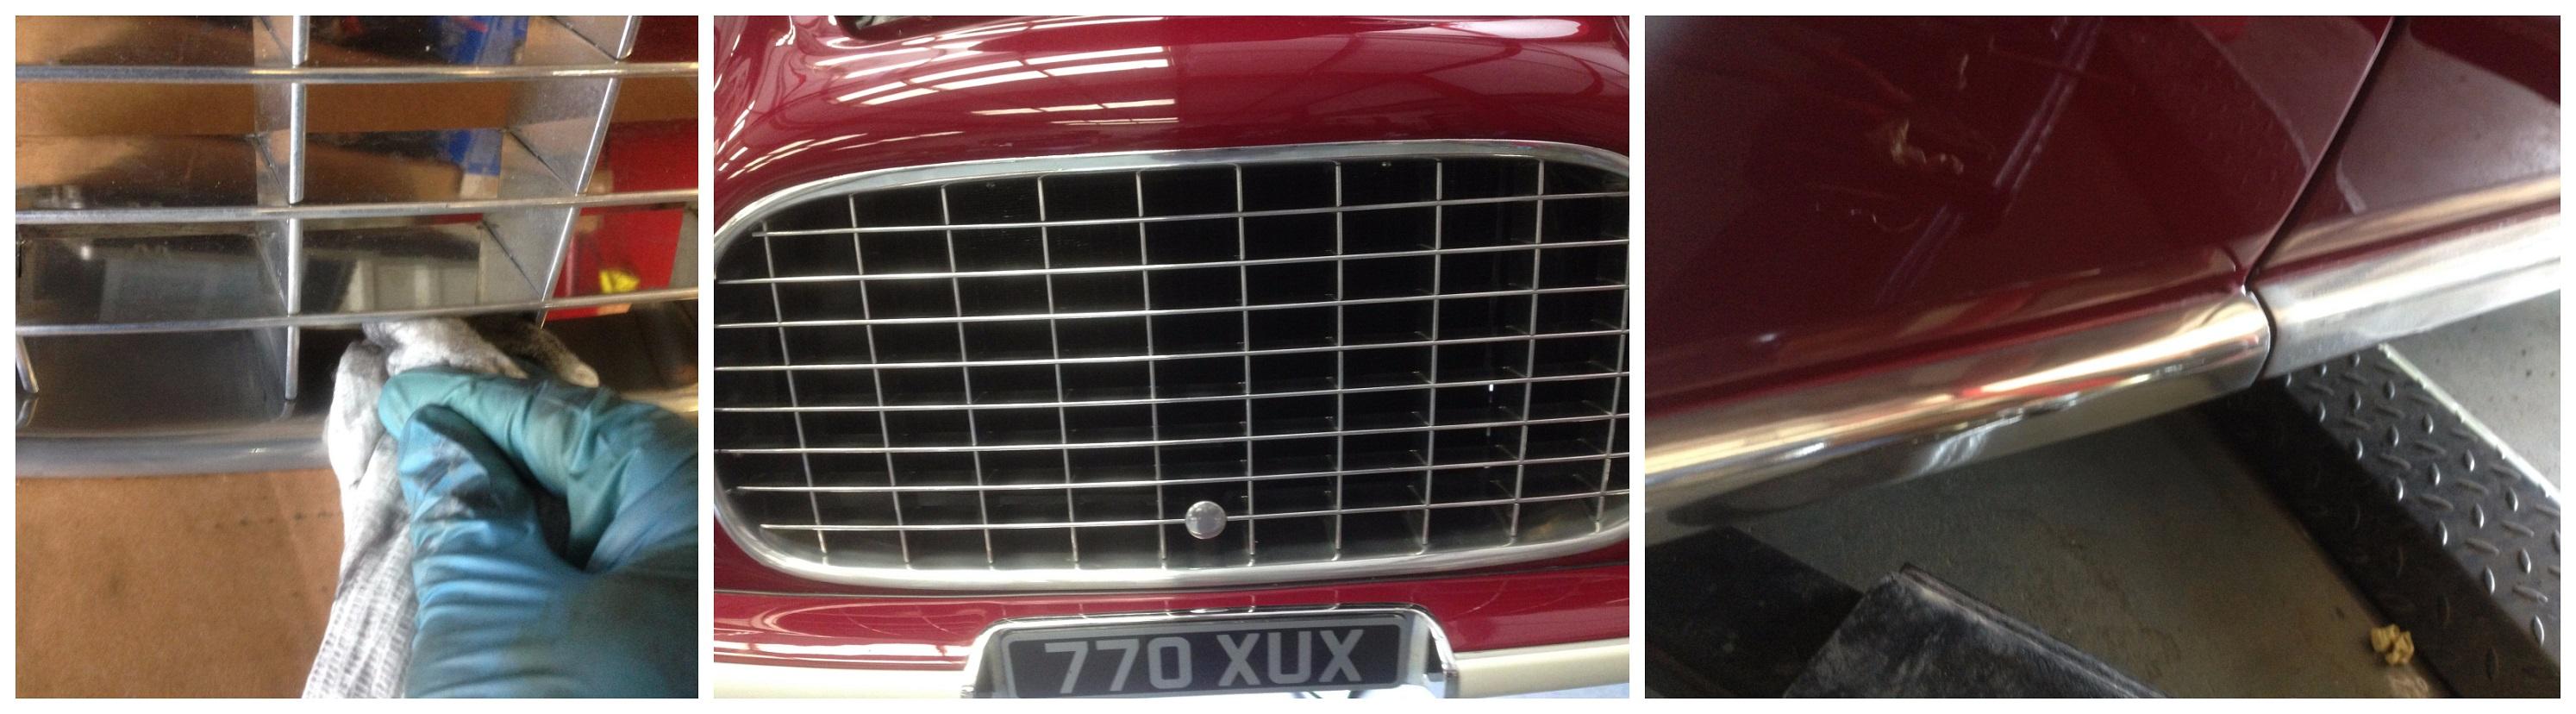 Ferrari Crate Grille : Ferrari tipo inter coupé pre show prep autoglym